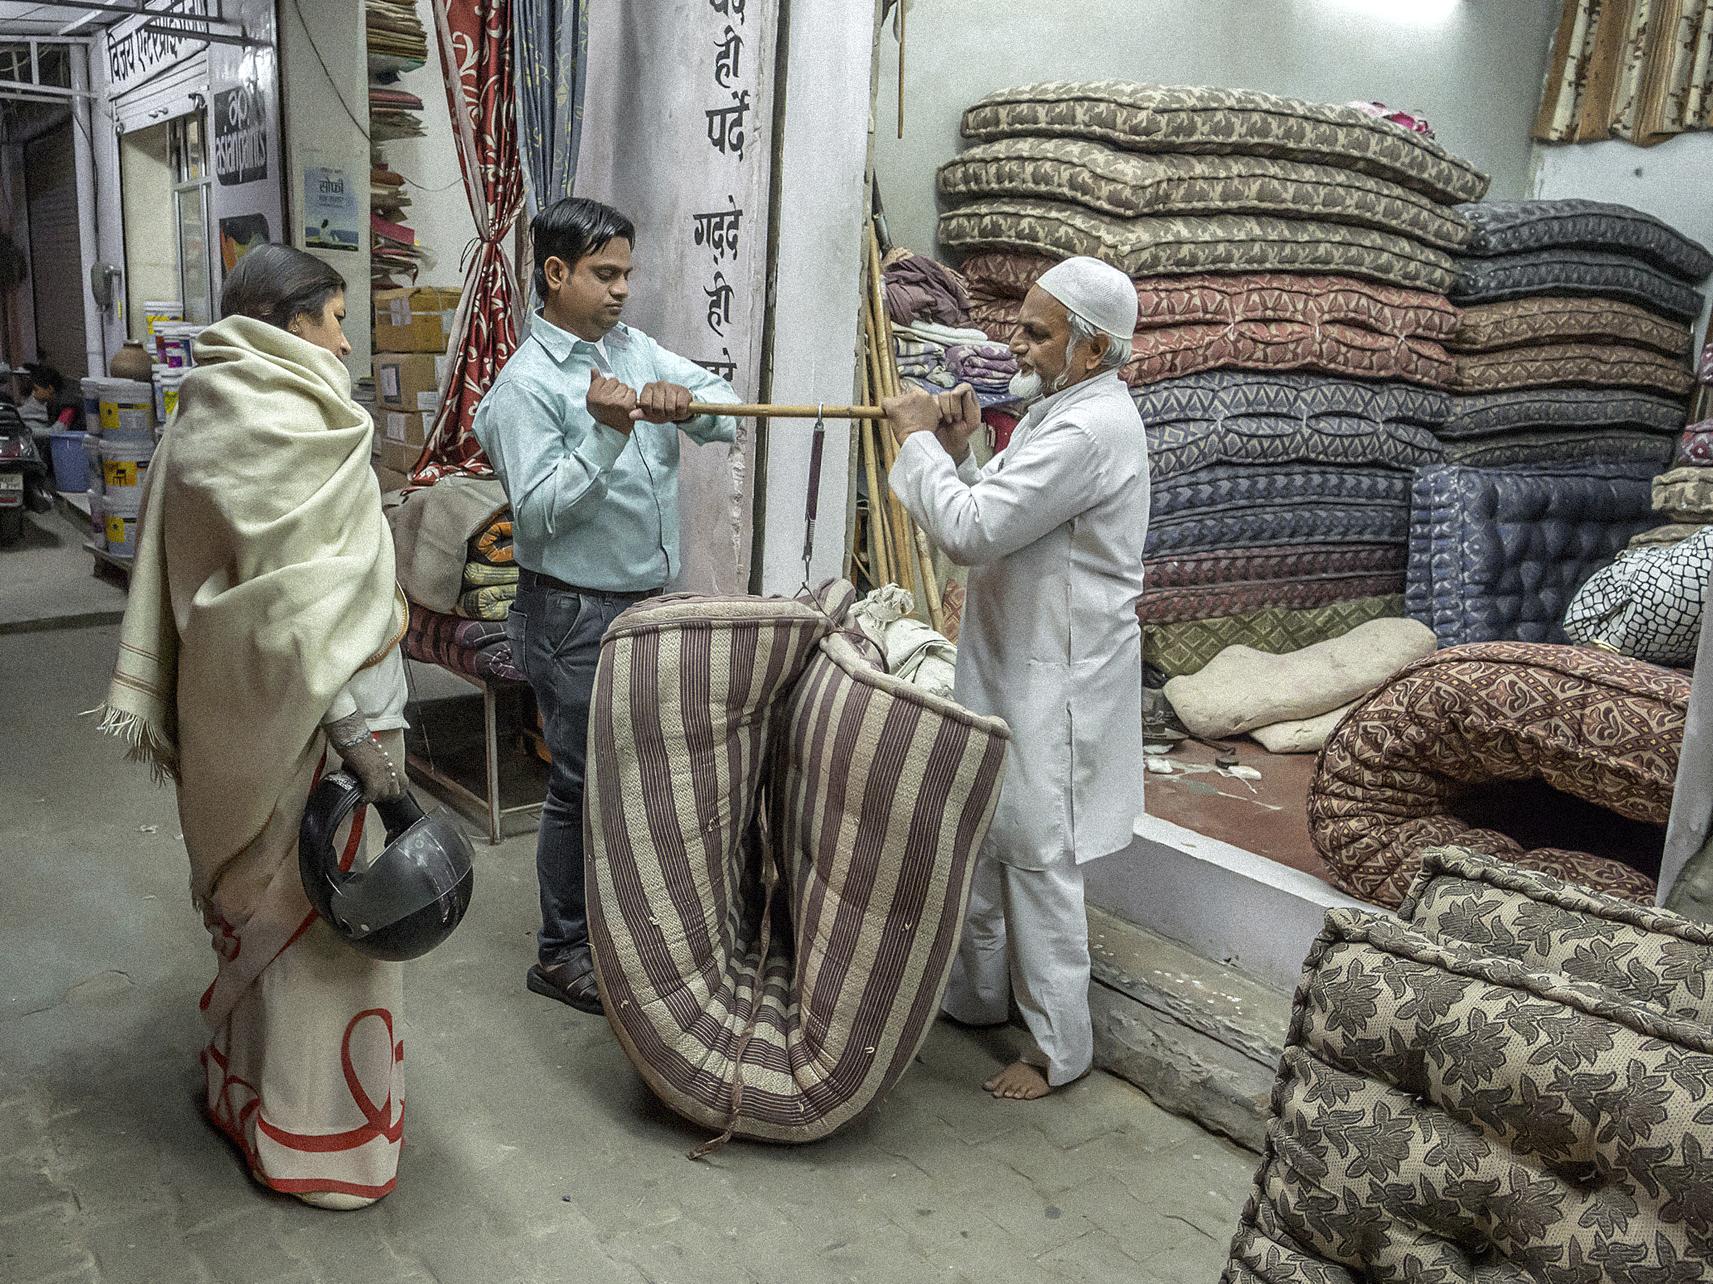 al bazaarjpg